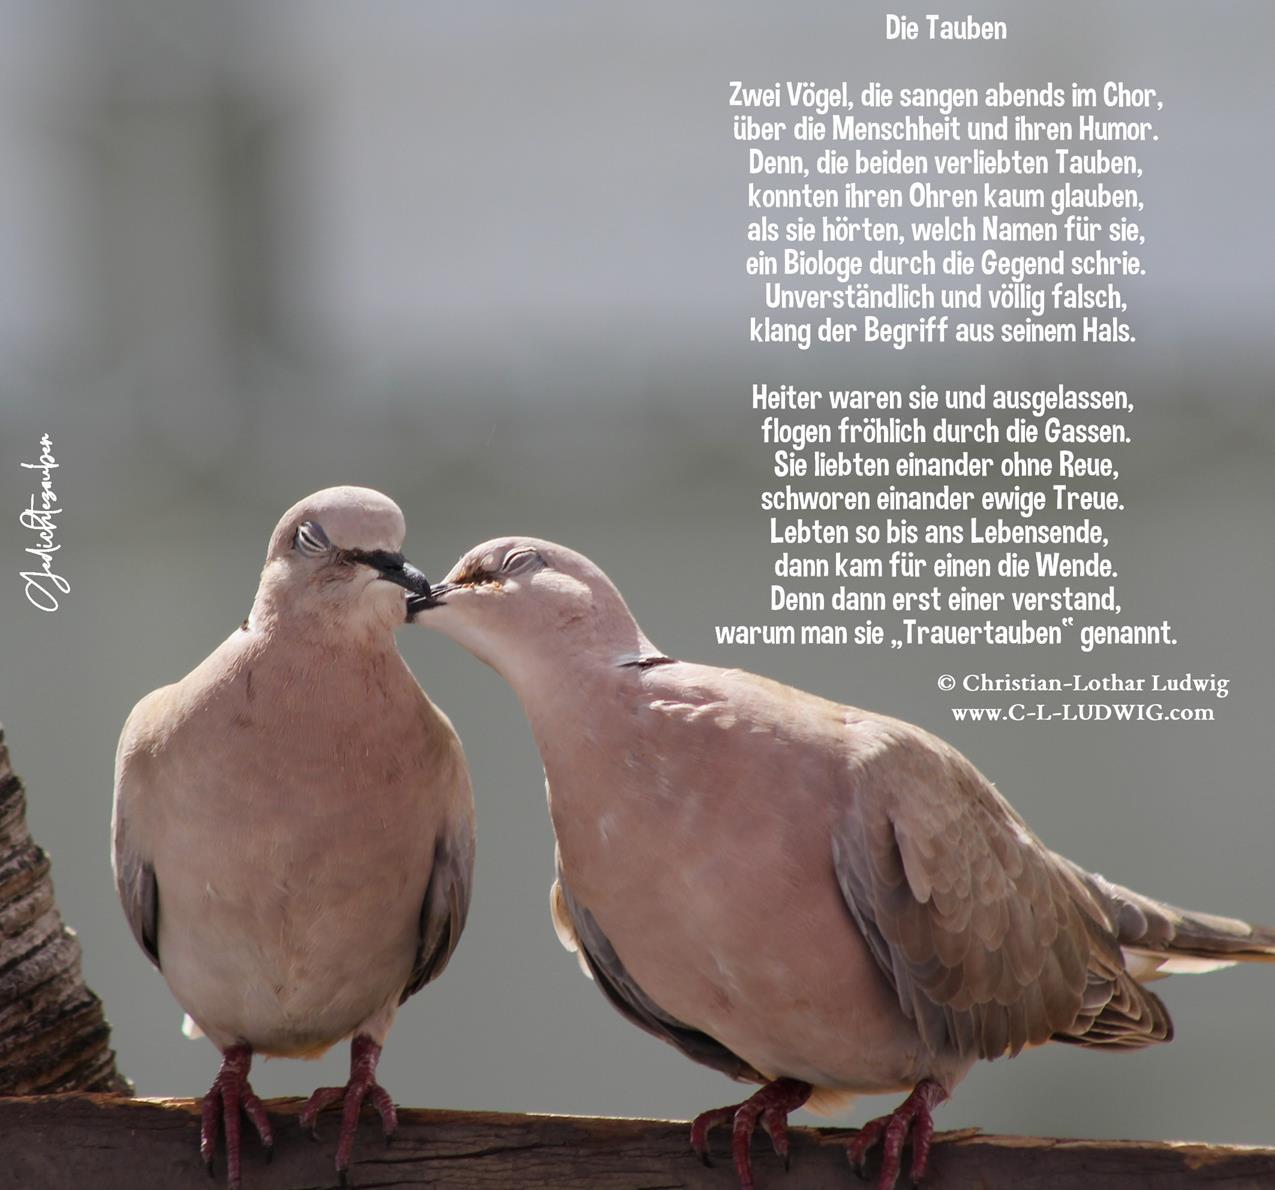 Die Tauben (Copy)